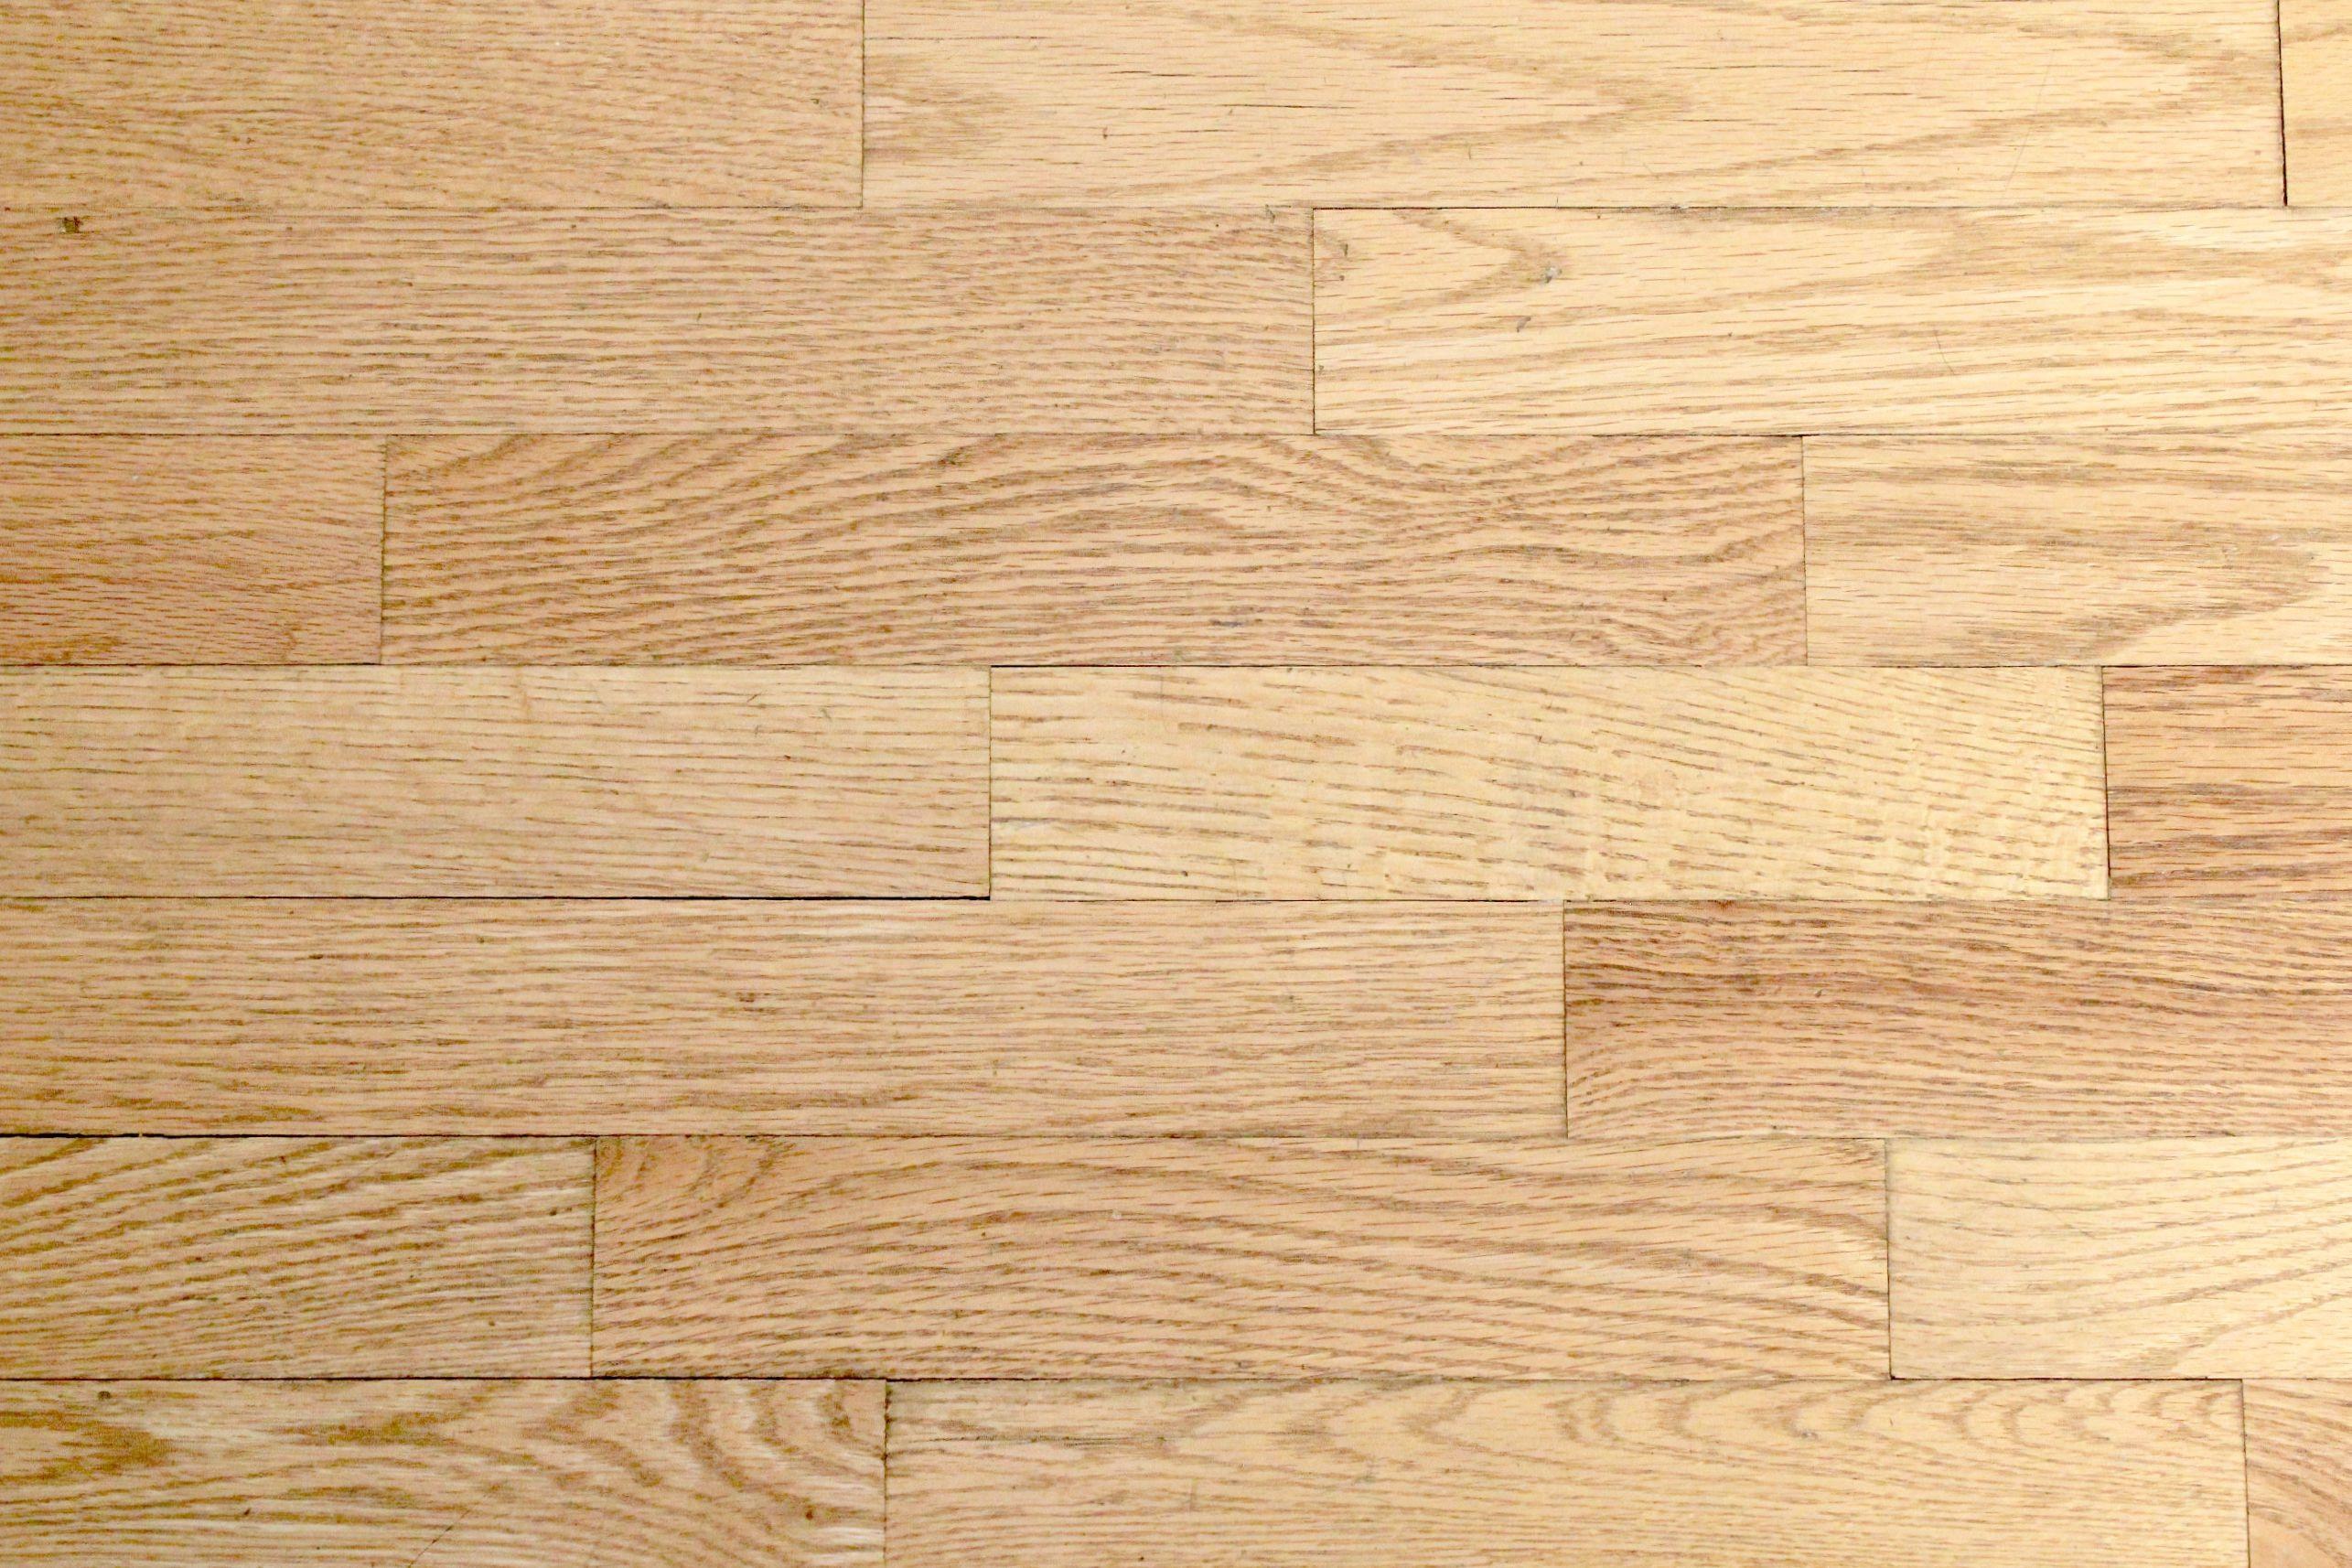 laminate or hardwood flooring of free images tile lumber surface wood floor hardwood wooden with light wood texture floor tile lumber surface wood floor hardwood wooden wood background light wood flooring